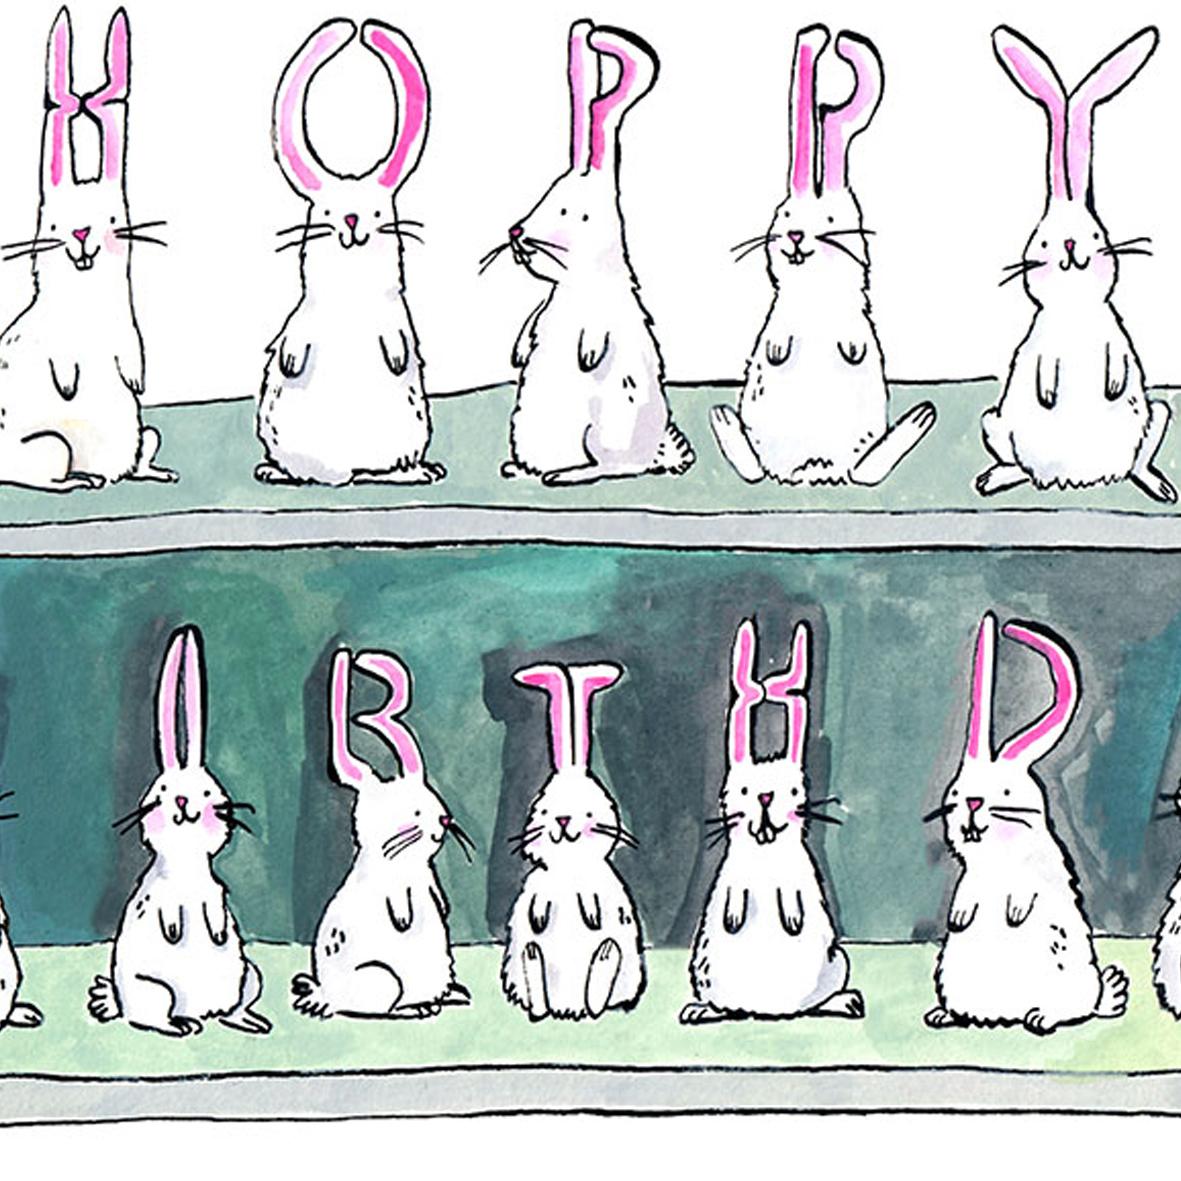 Magical-Day_-Magician-birthday-card.-Birthday-card-with-magic-theme-_BD01_CU